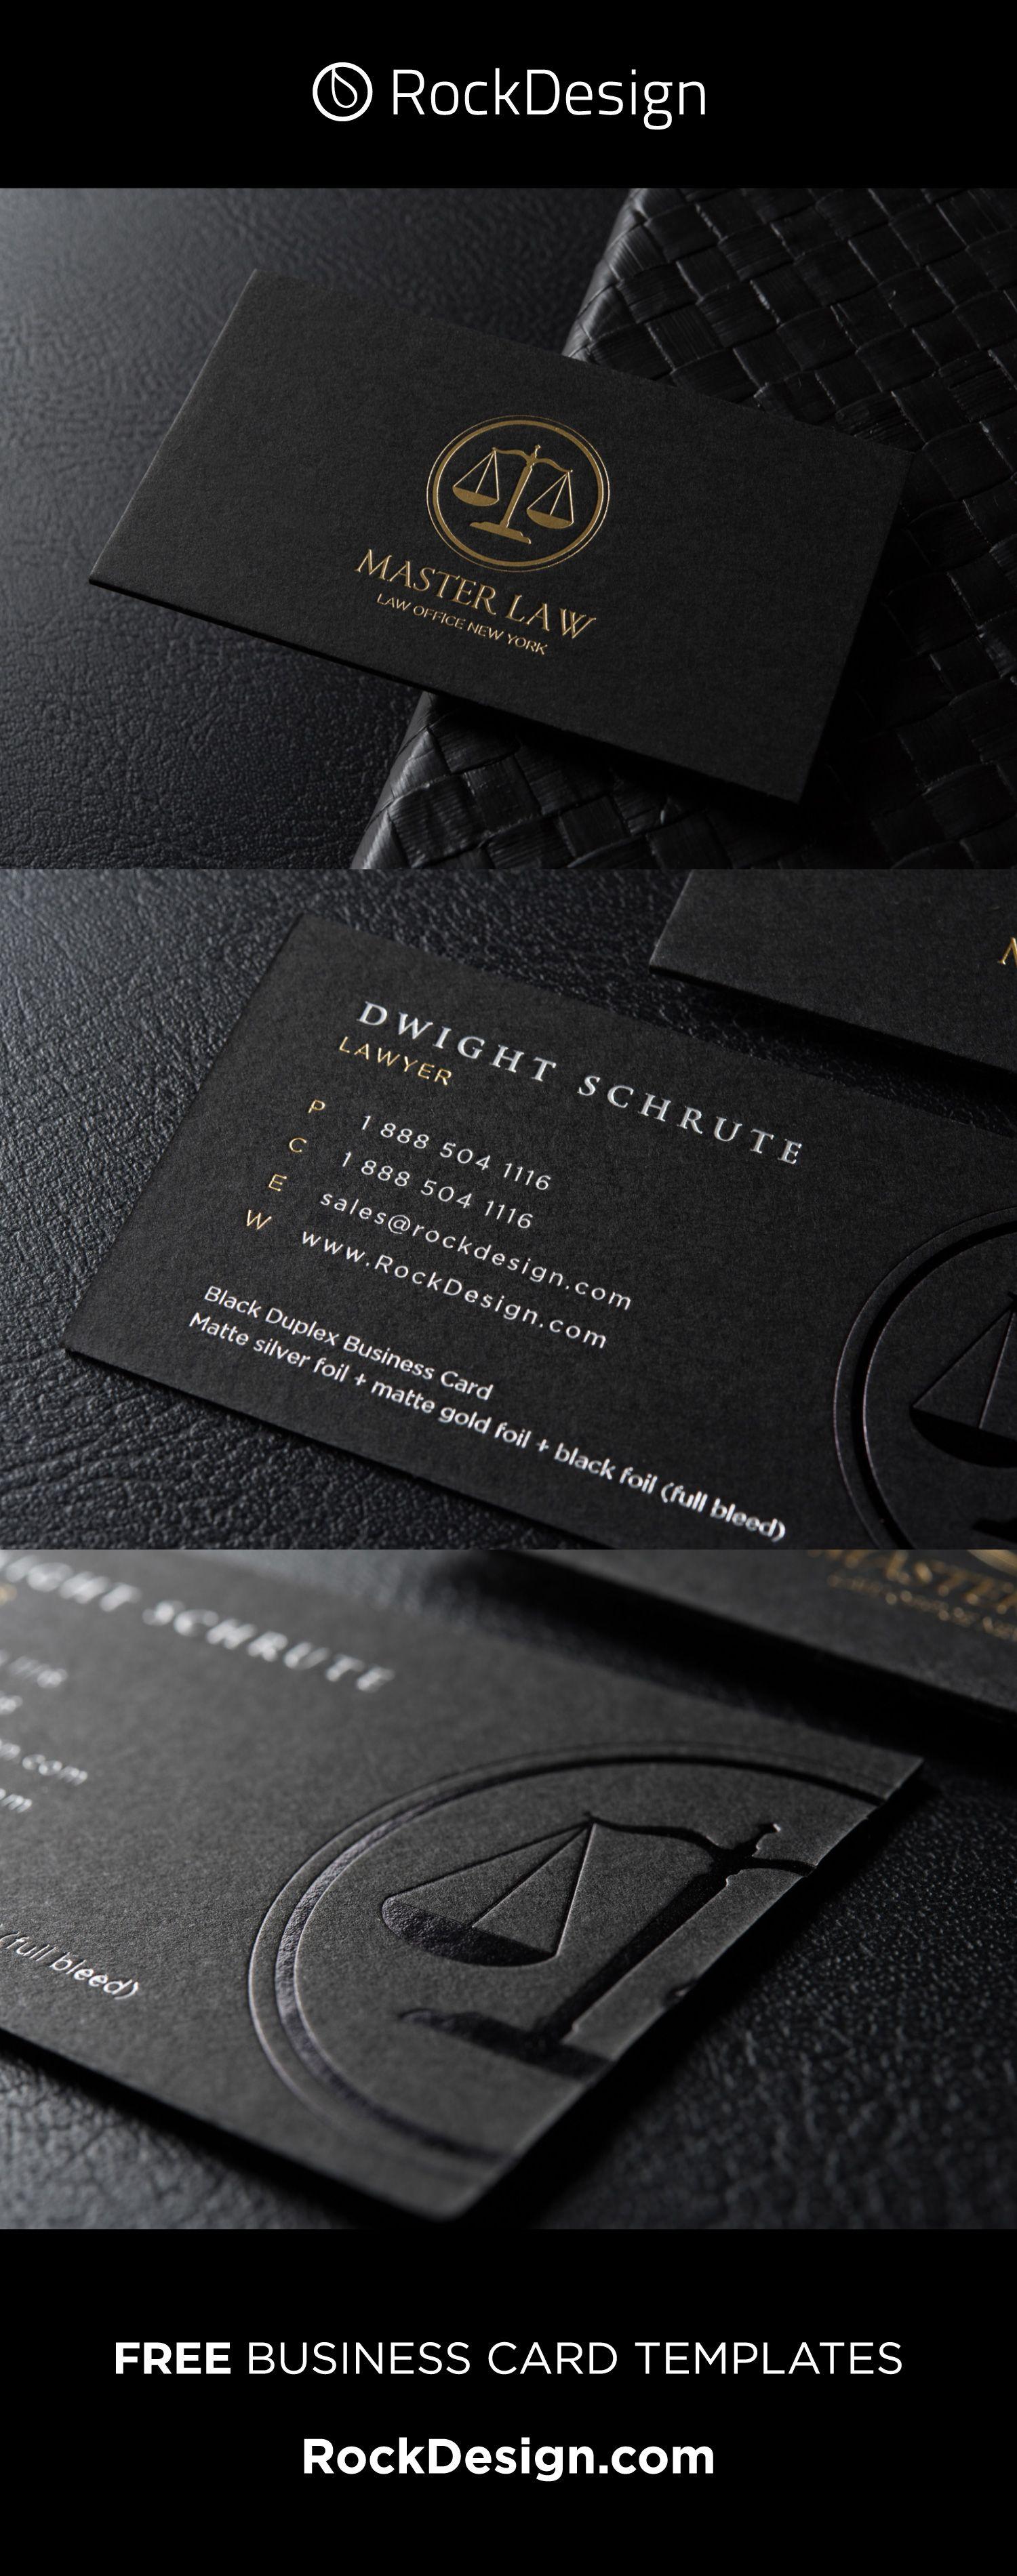 CLASSIC MODERN BLACK DUPLEX ATTORNEY BUSINESS CARD TEMPLATE – MASTER LAW